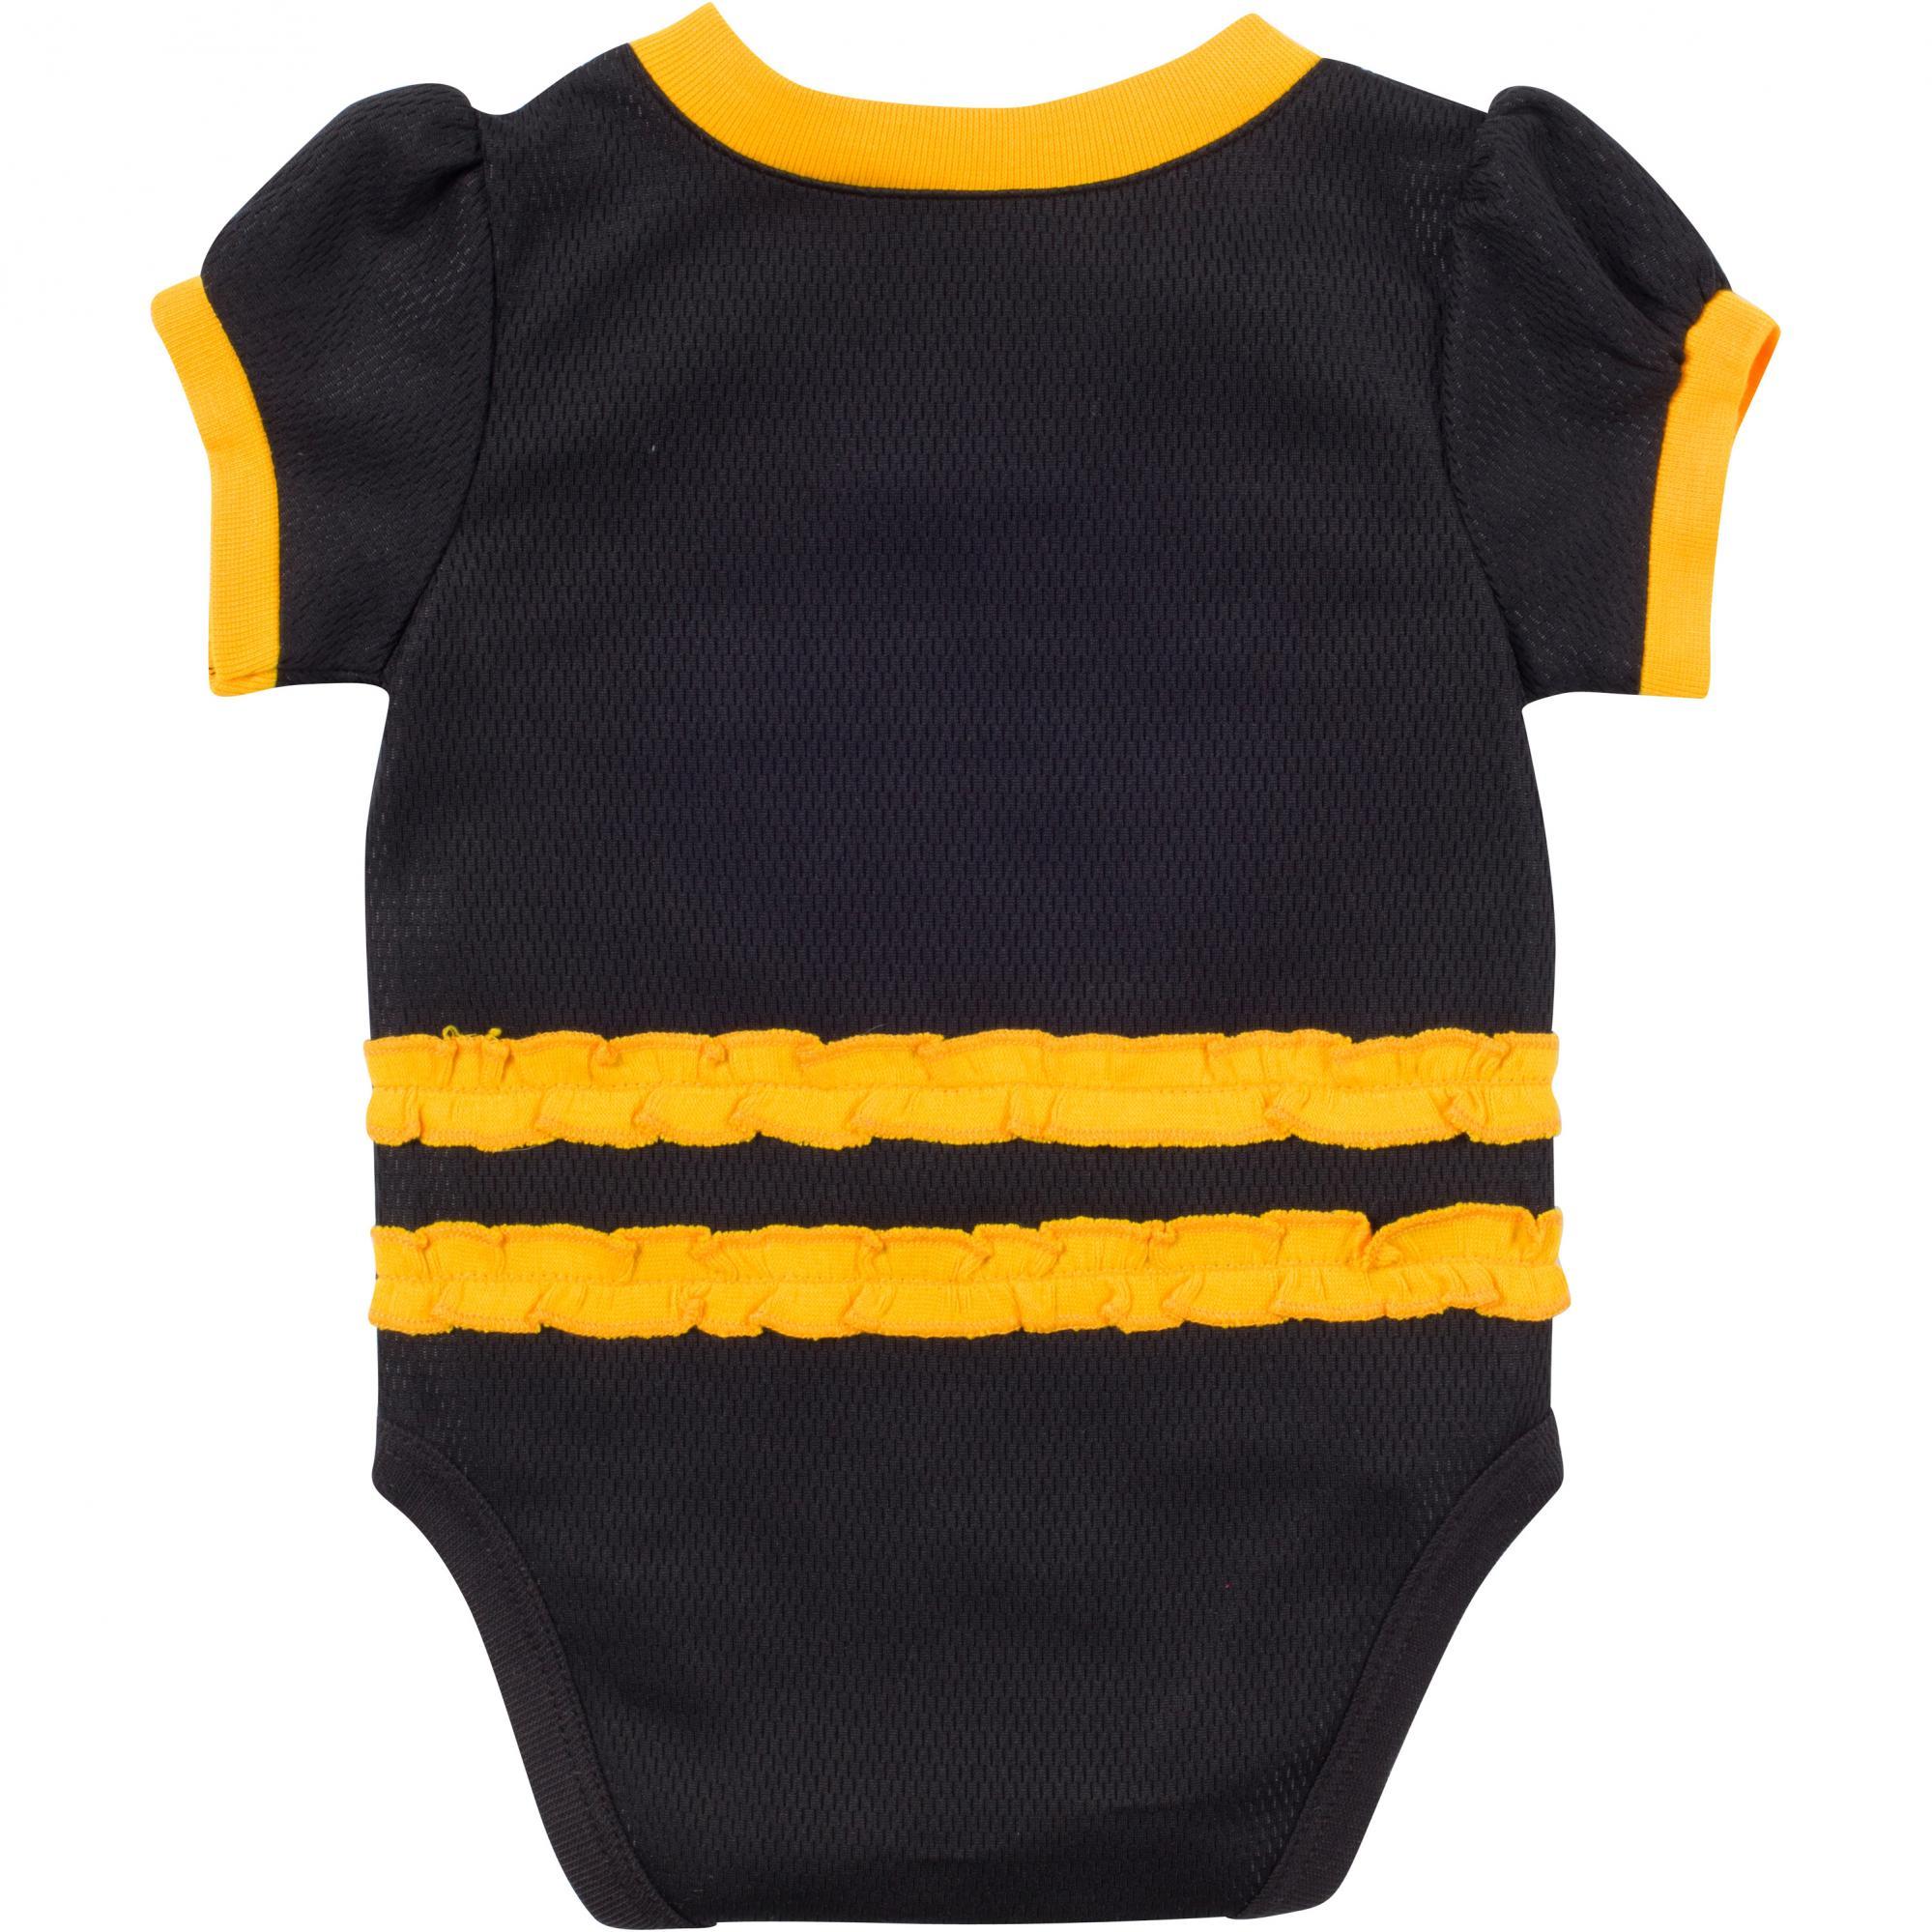 steelers-baby-rufflebutt-player-jersey-bodysuit-1680-back.jpg